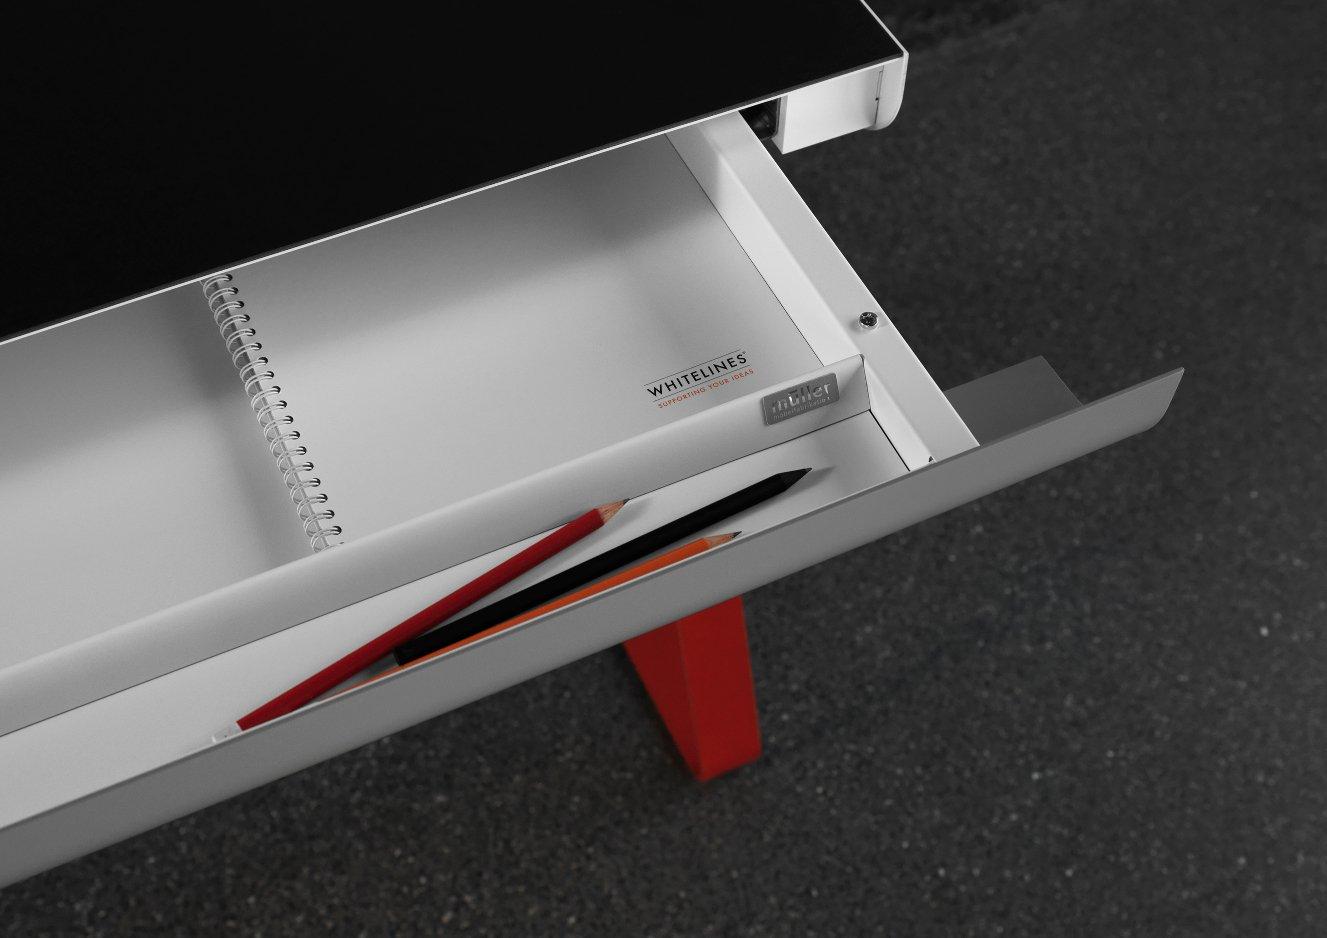 Secretary Desk PS10 from Muller